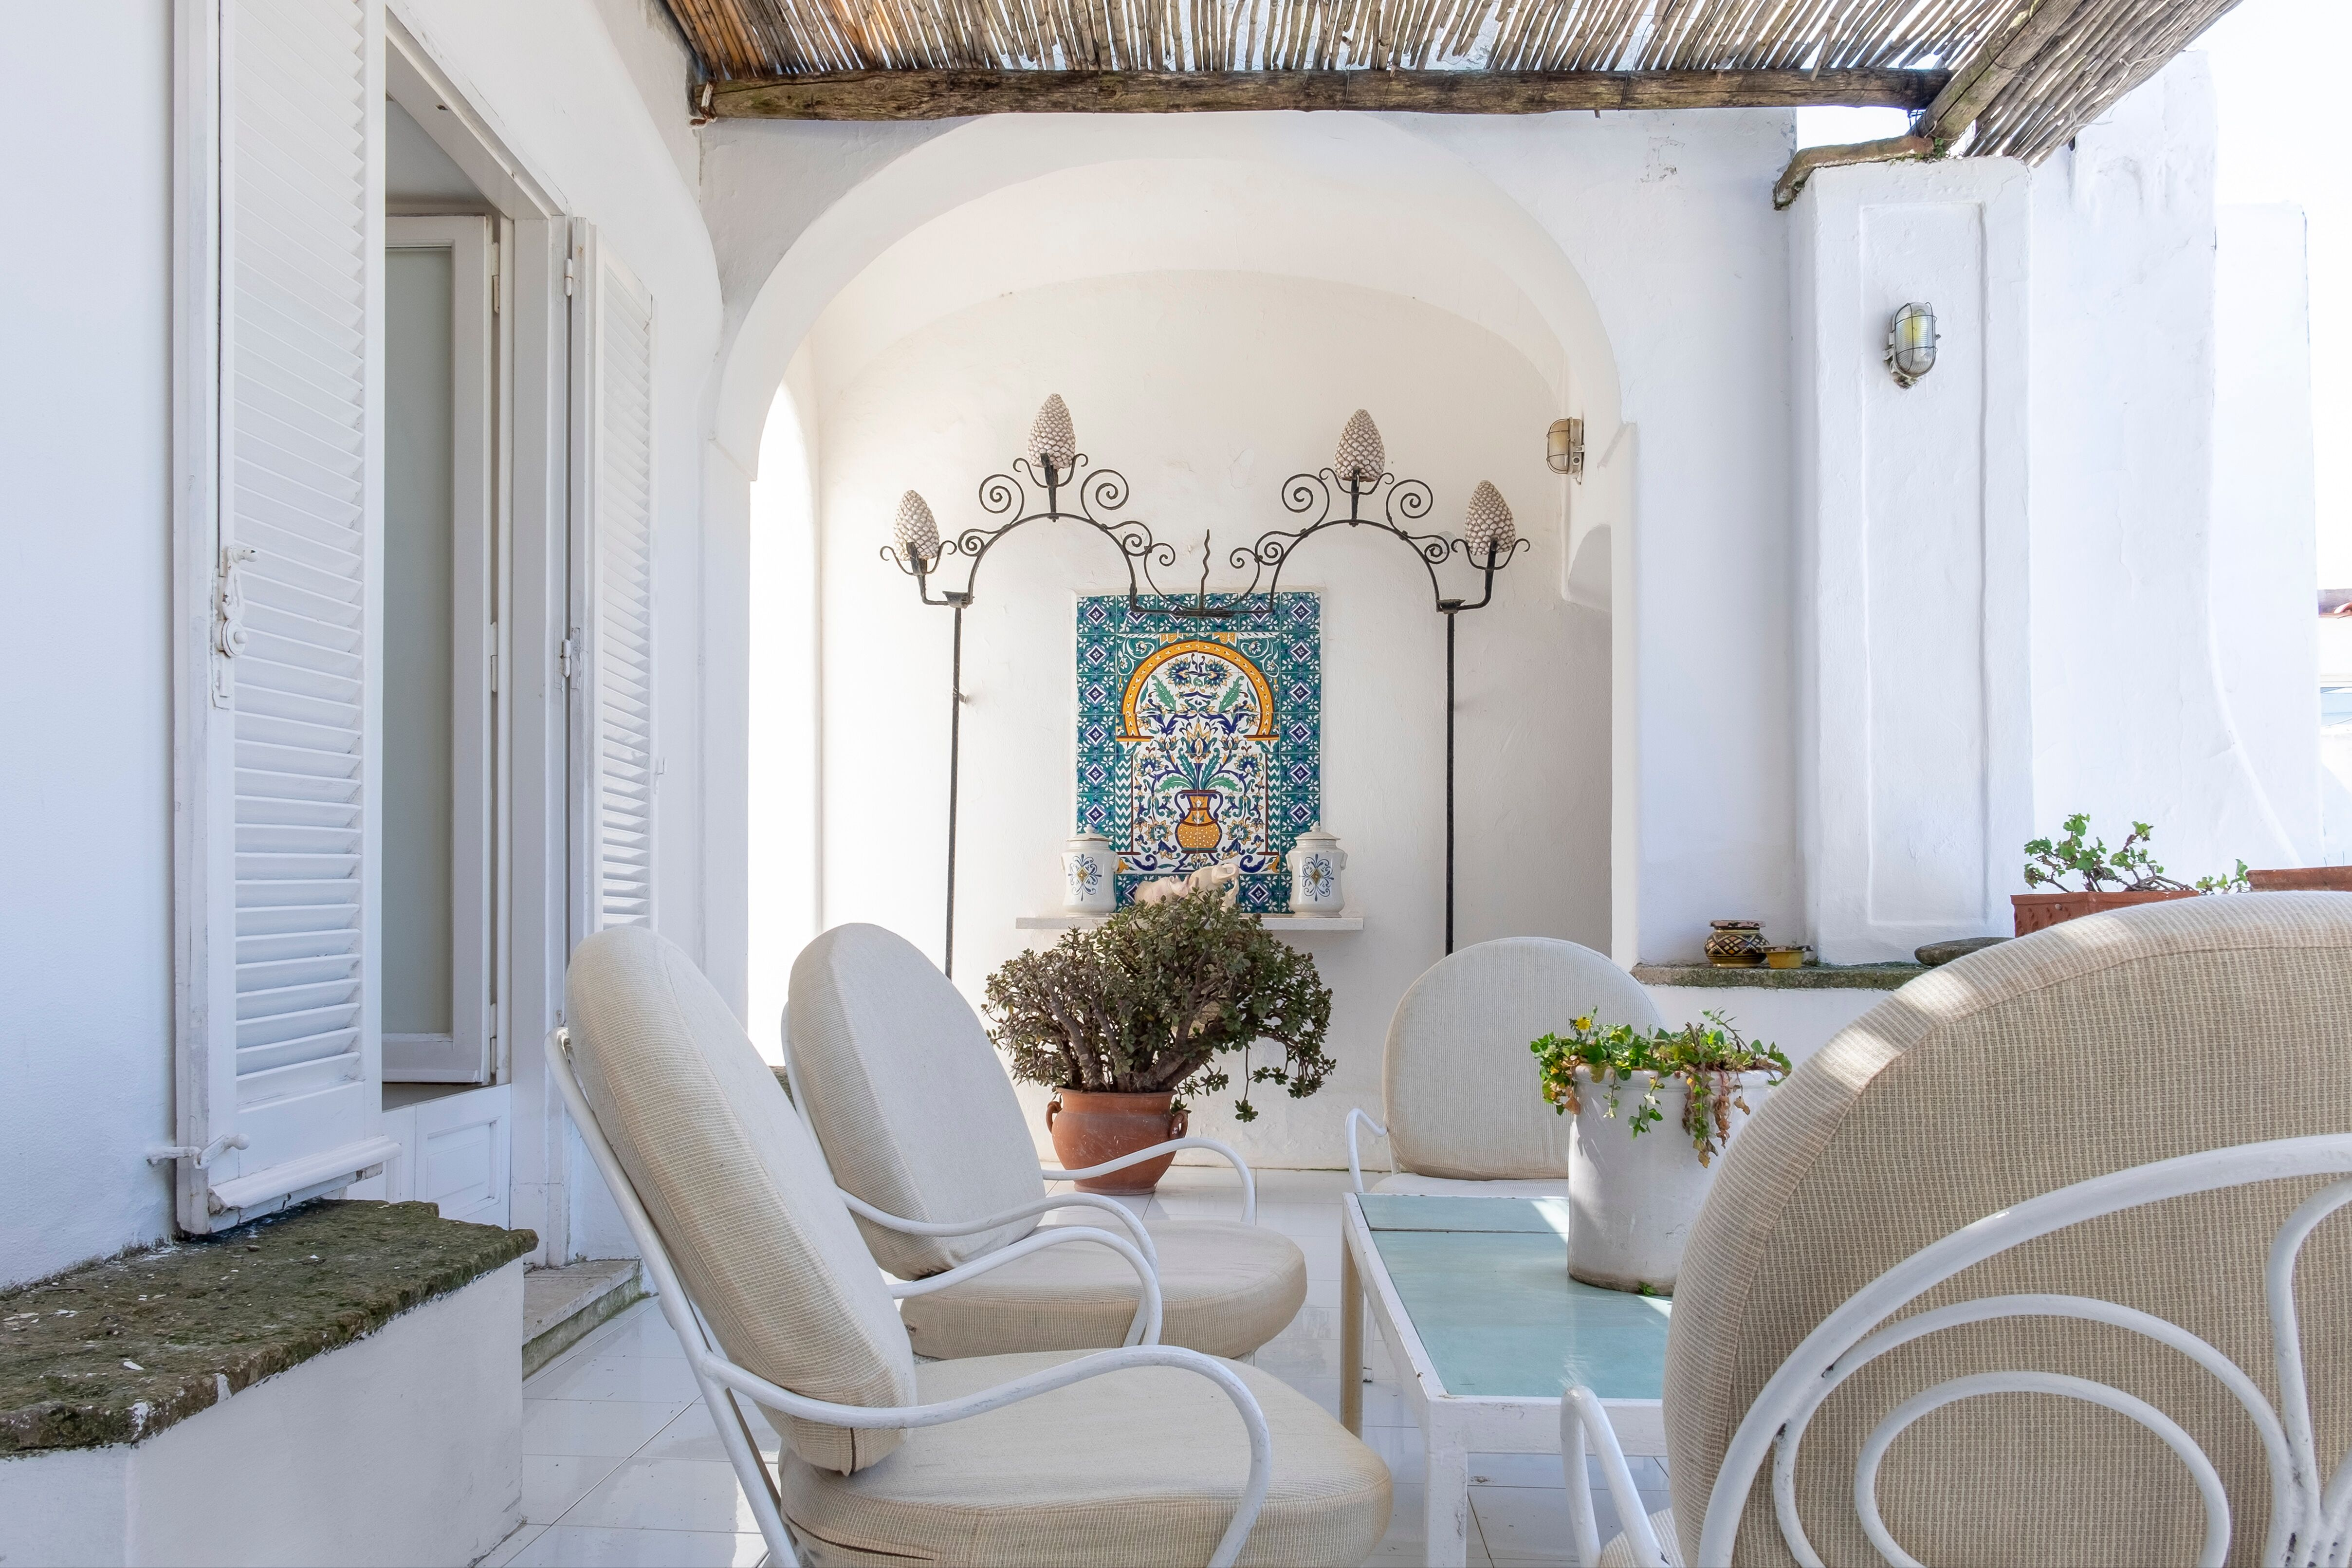 La casa di Mme Colette a Capri, salone / Italy Sothebys International Realty